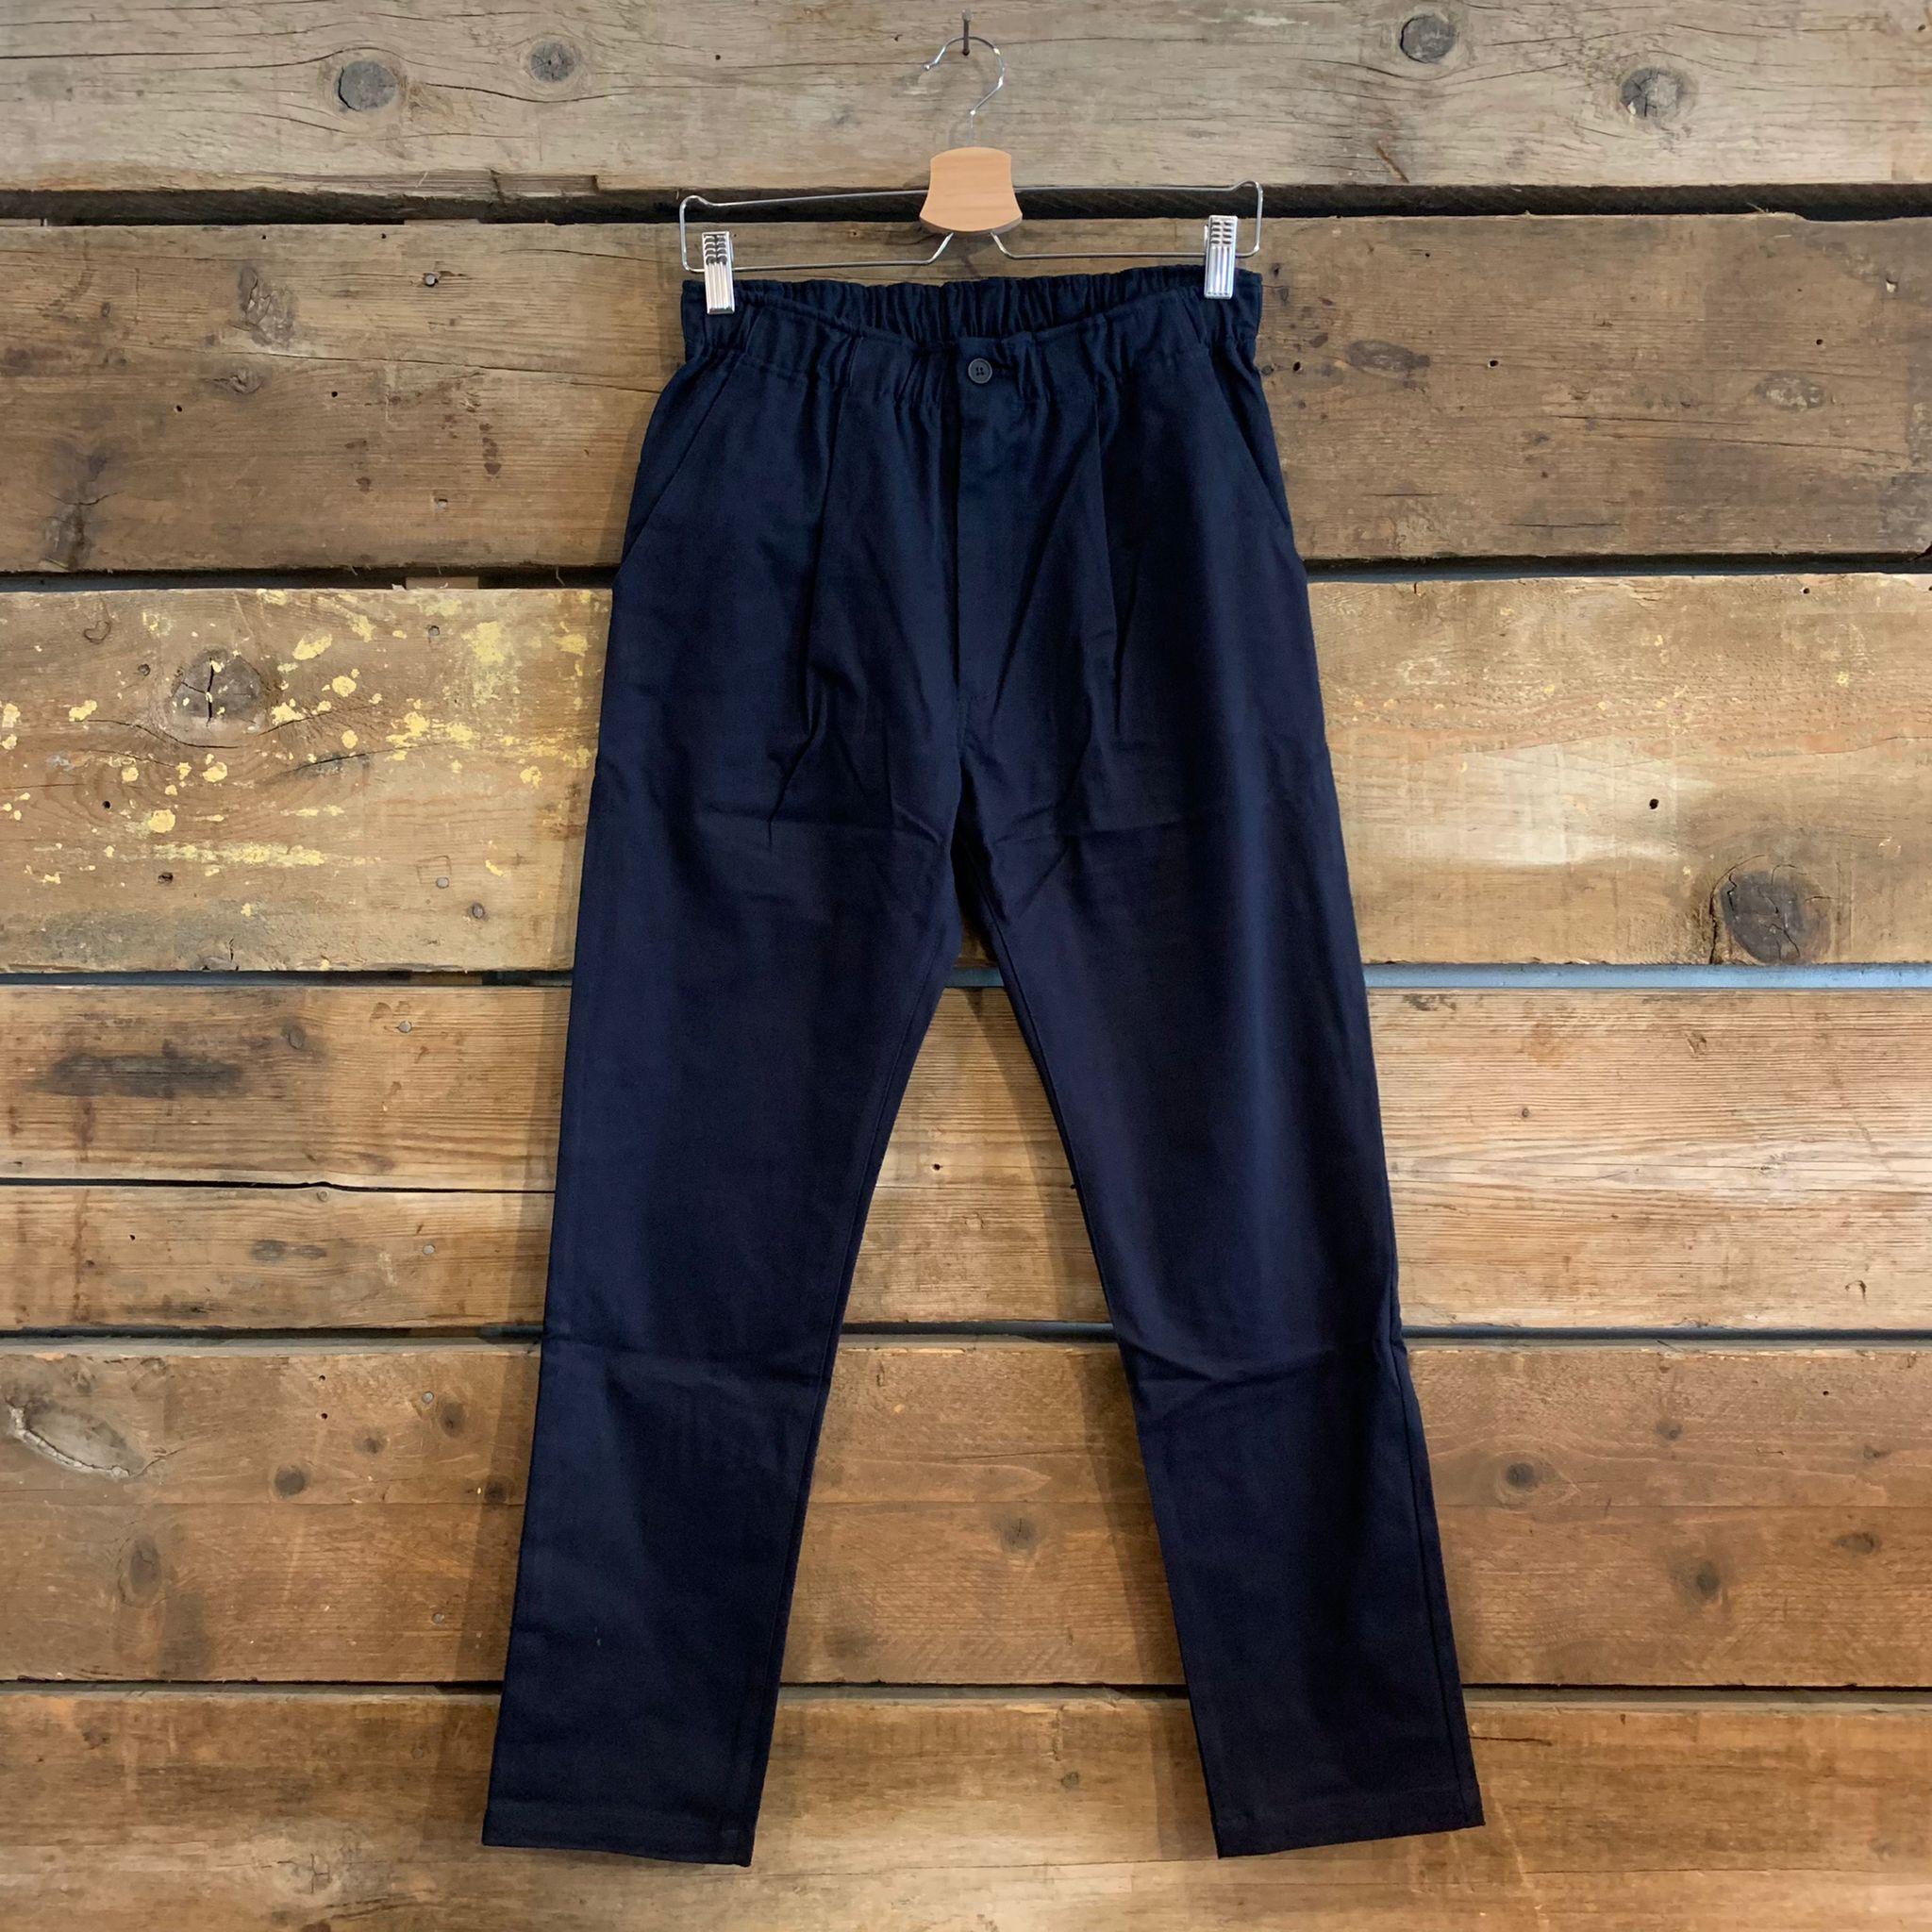 Pantalone Bakery Supplies Lowan Gabardine Blu Navy FW21